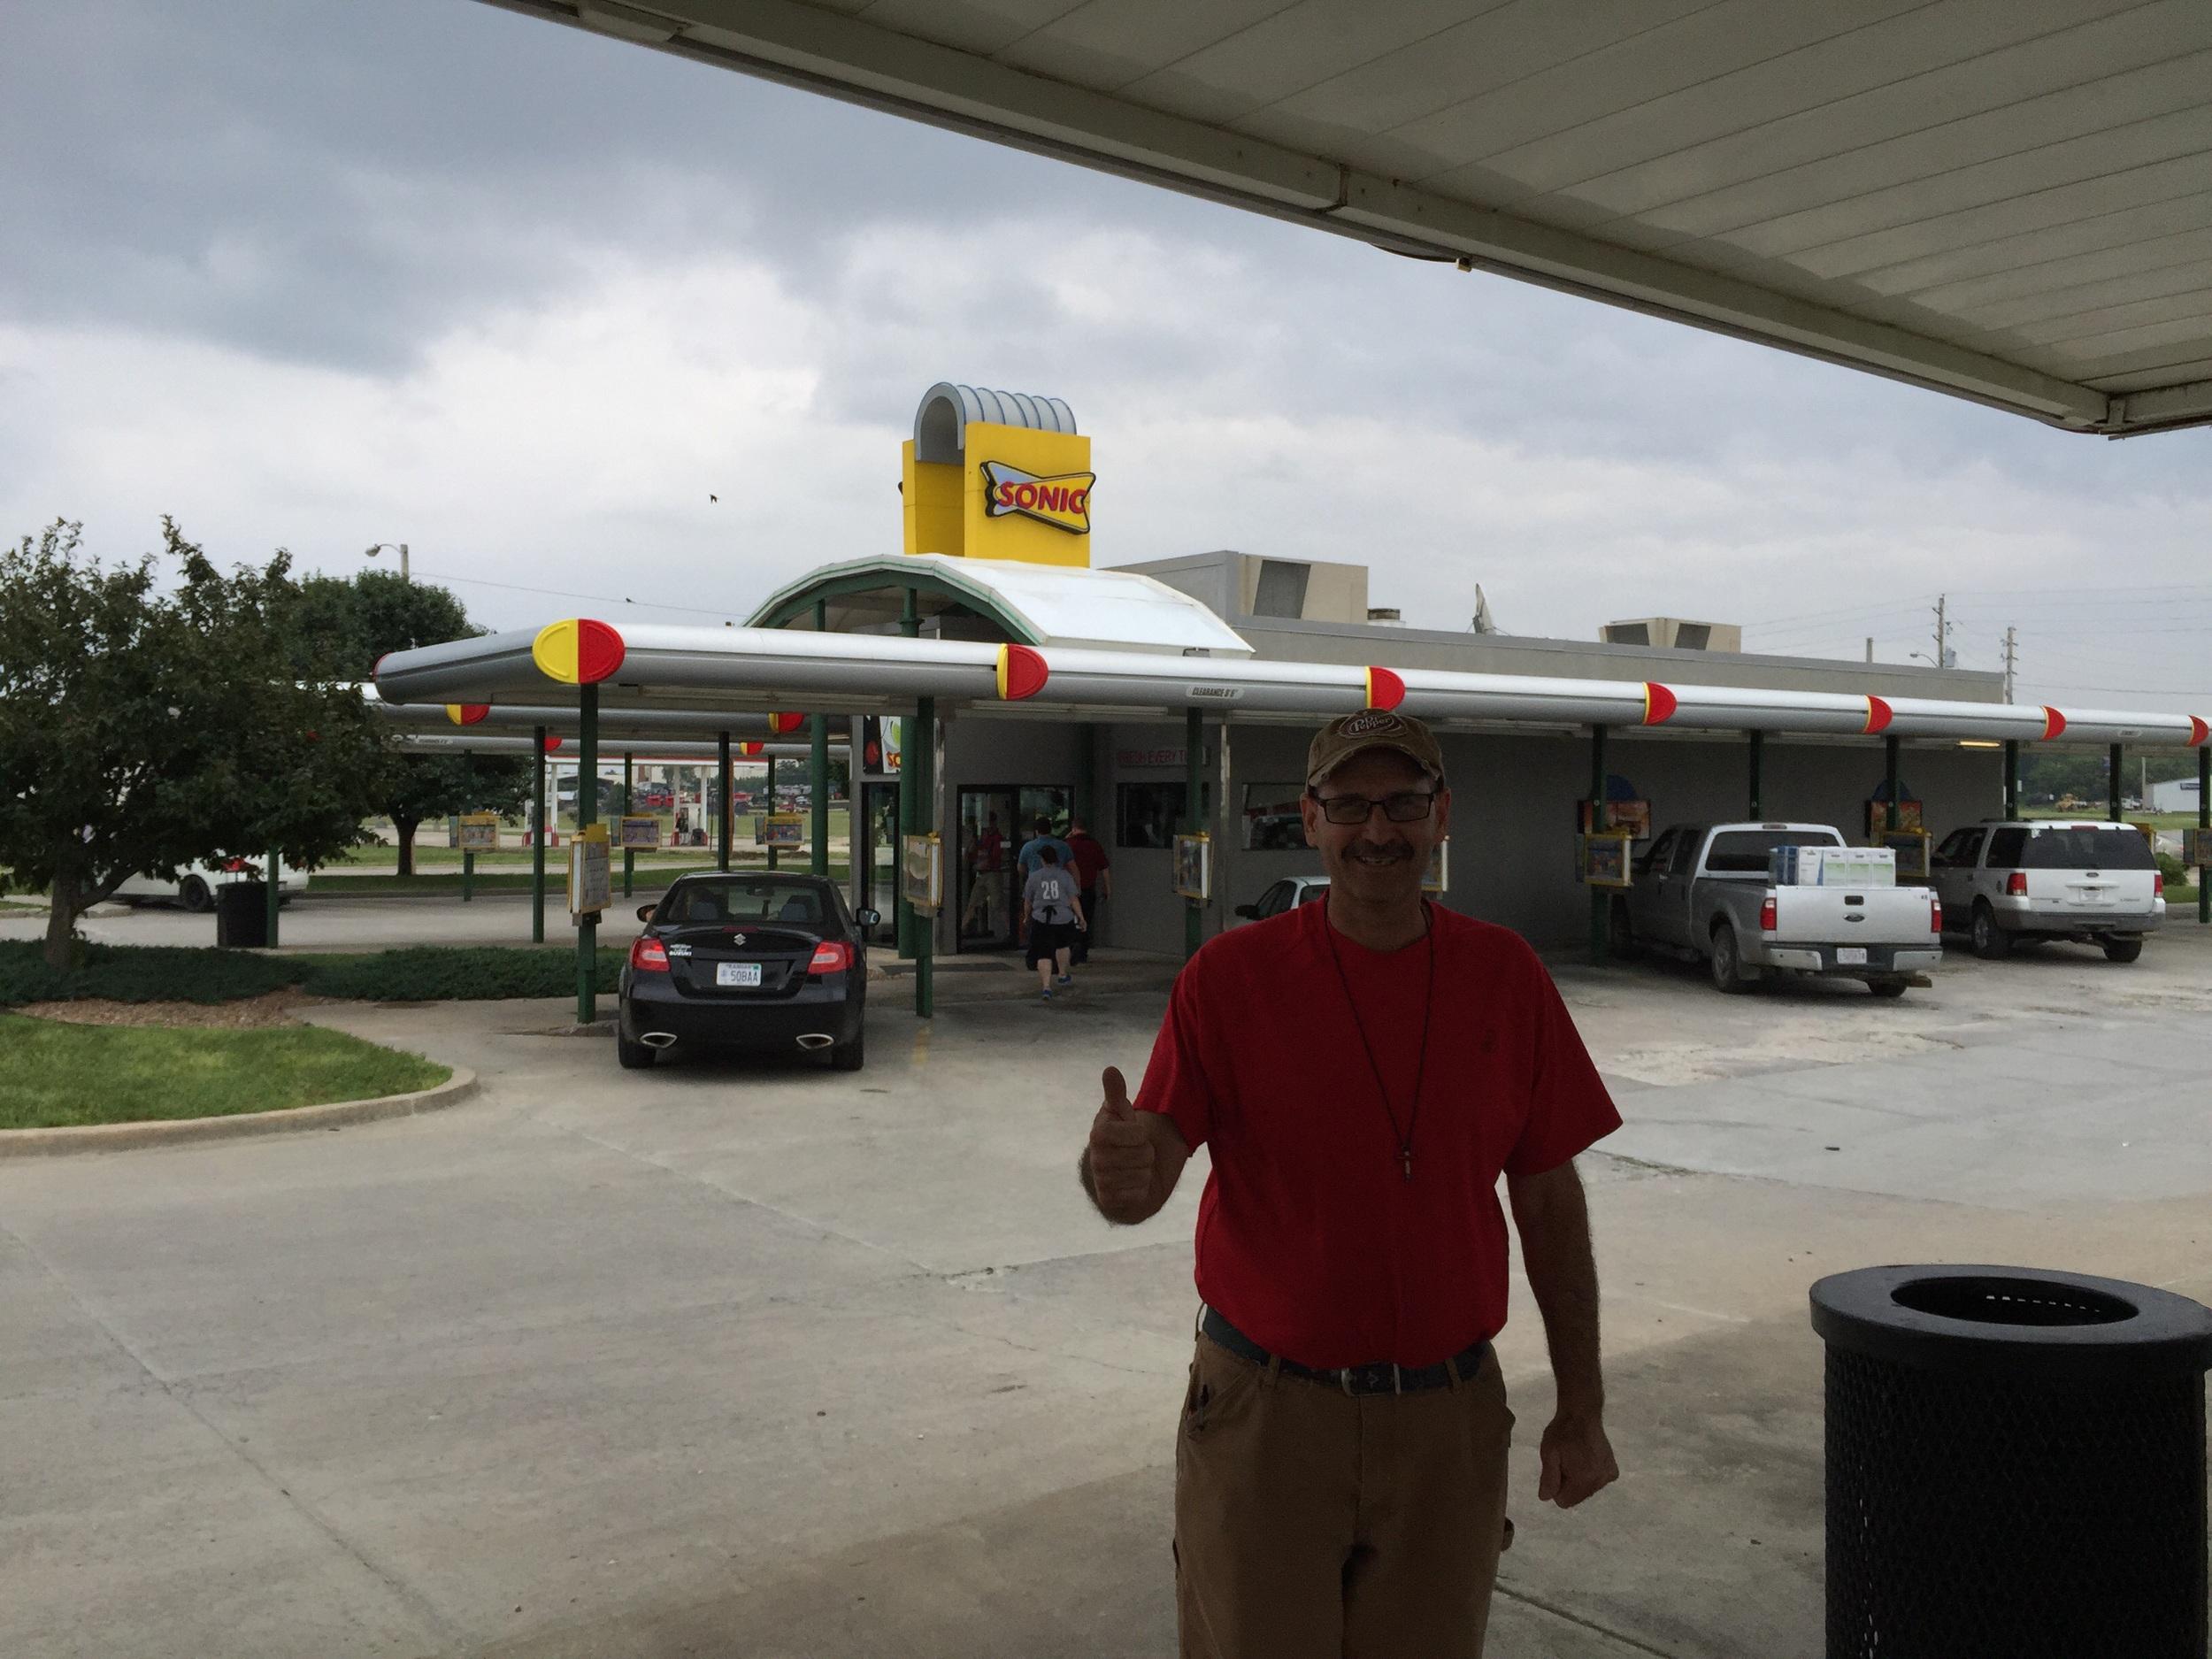 Jason Sjorlund in front of his Hillsboro Kansas Sonic